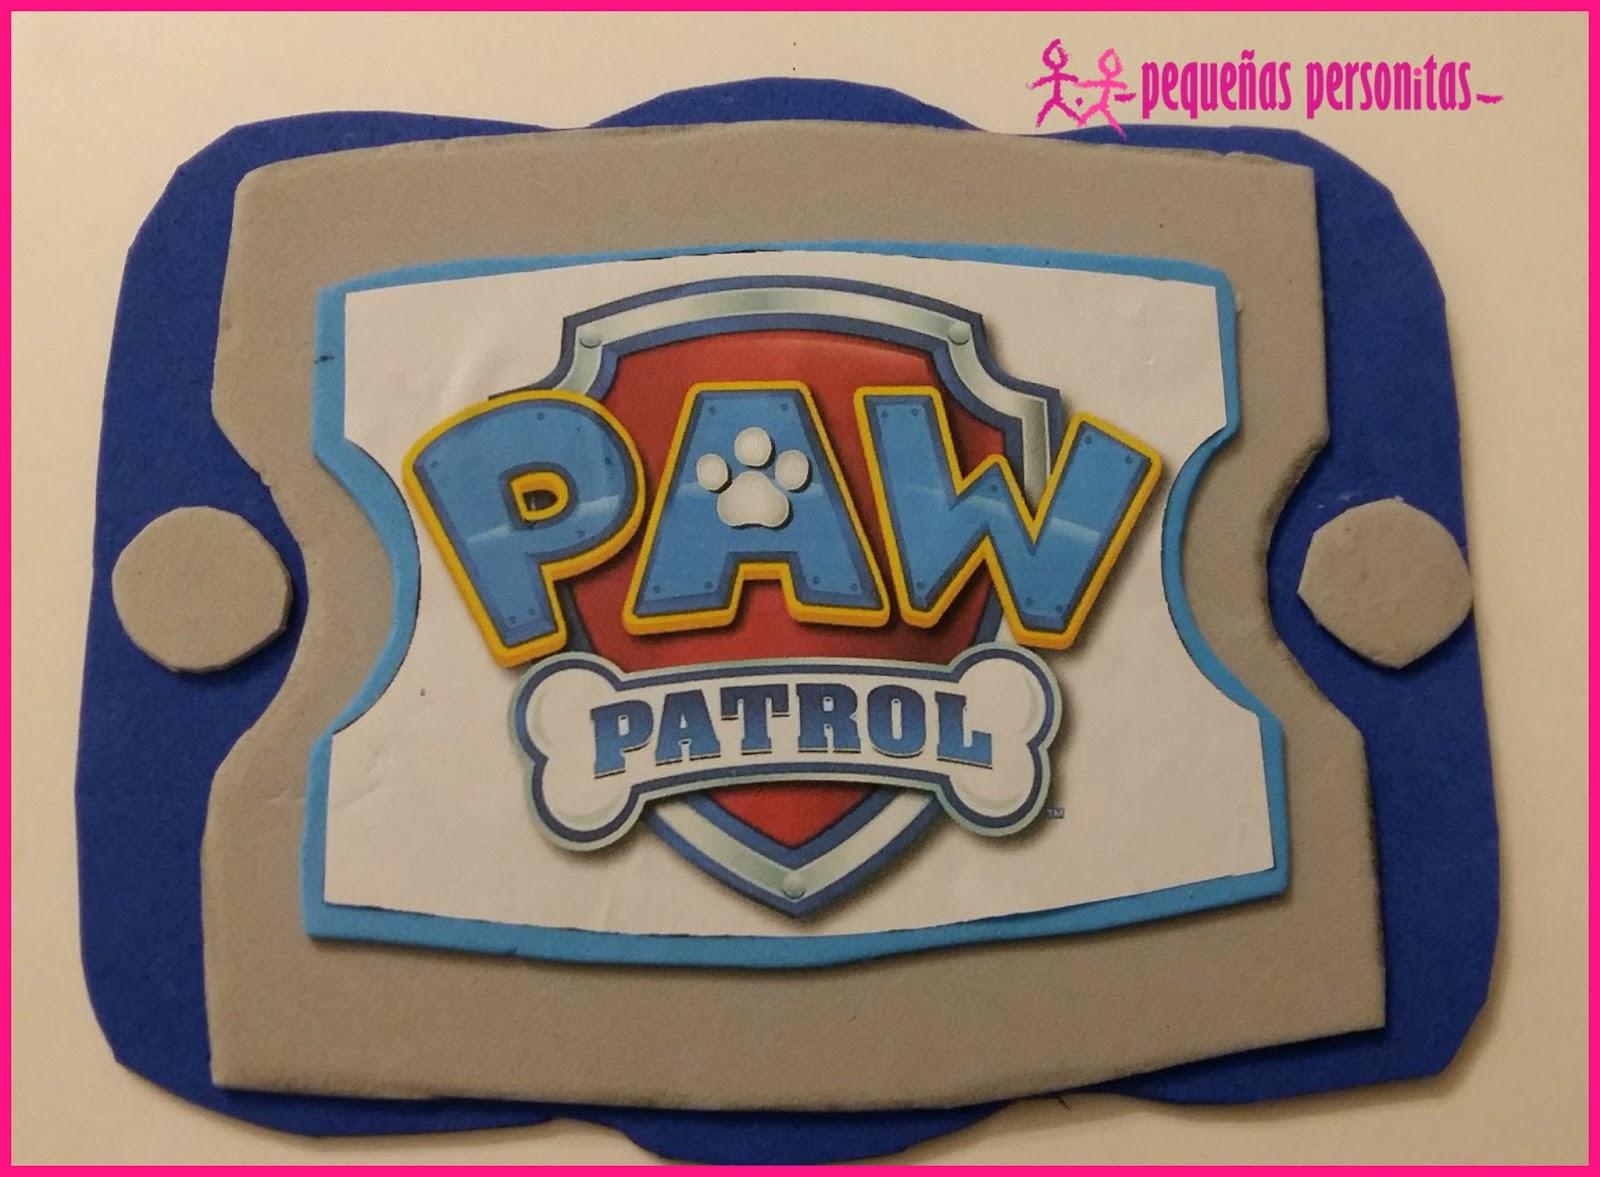 Diy paw pad de la patrulla canina con goma eva peque as - Manualidades patrulla canina ...